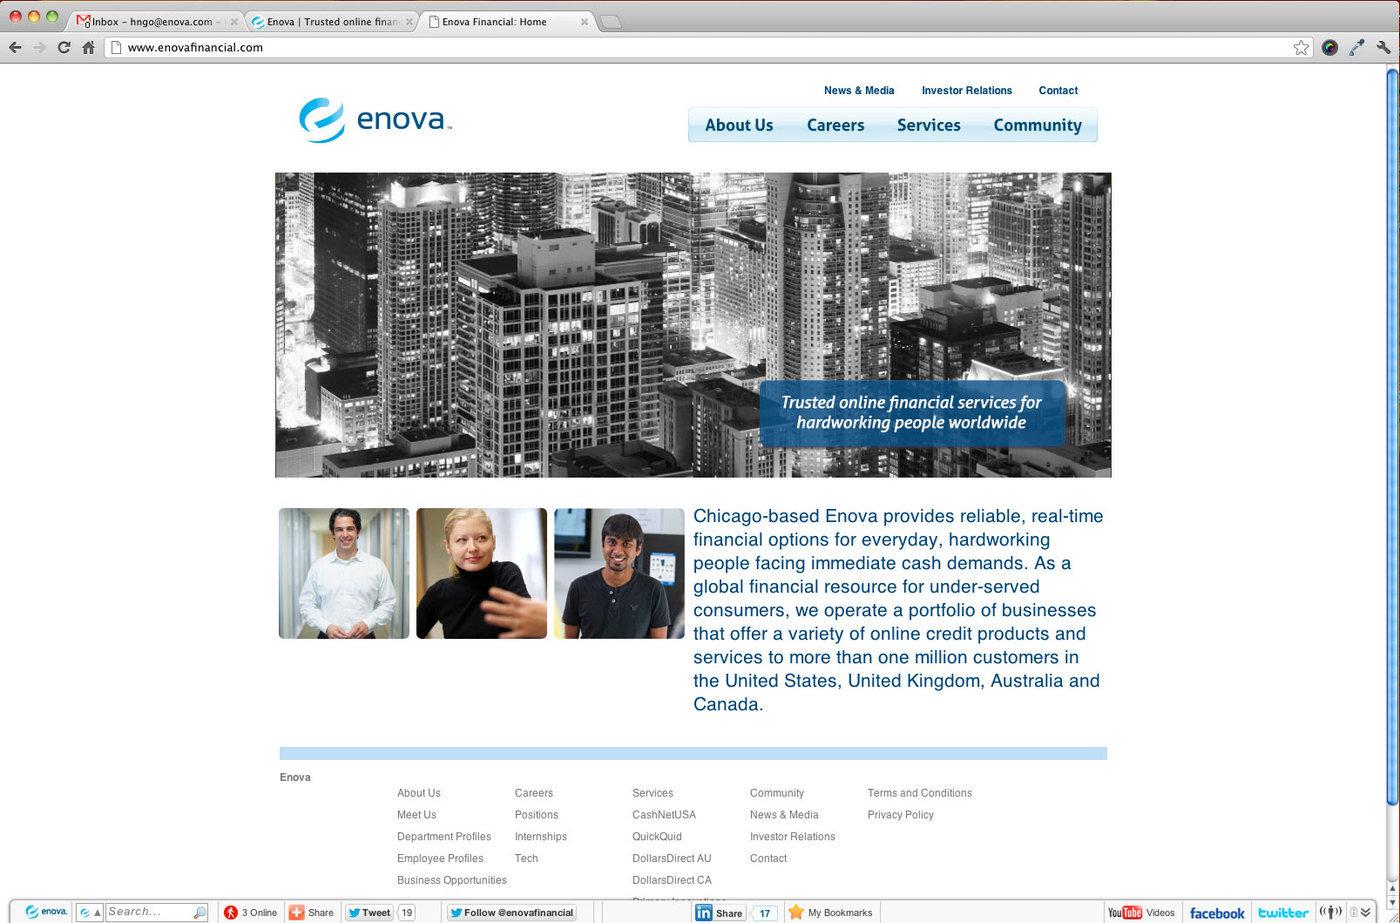 Enova Website Redesign By Huong Ngo At Coroflot